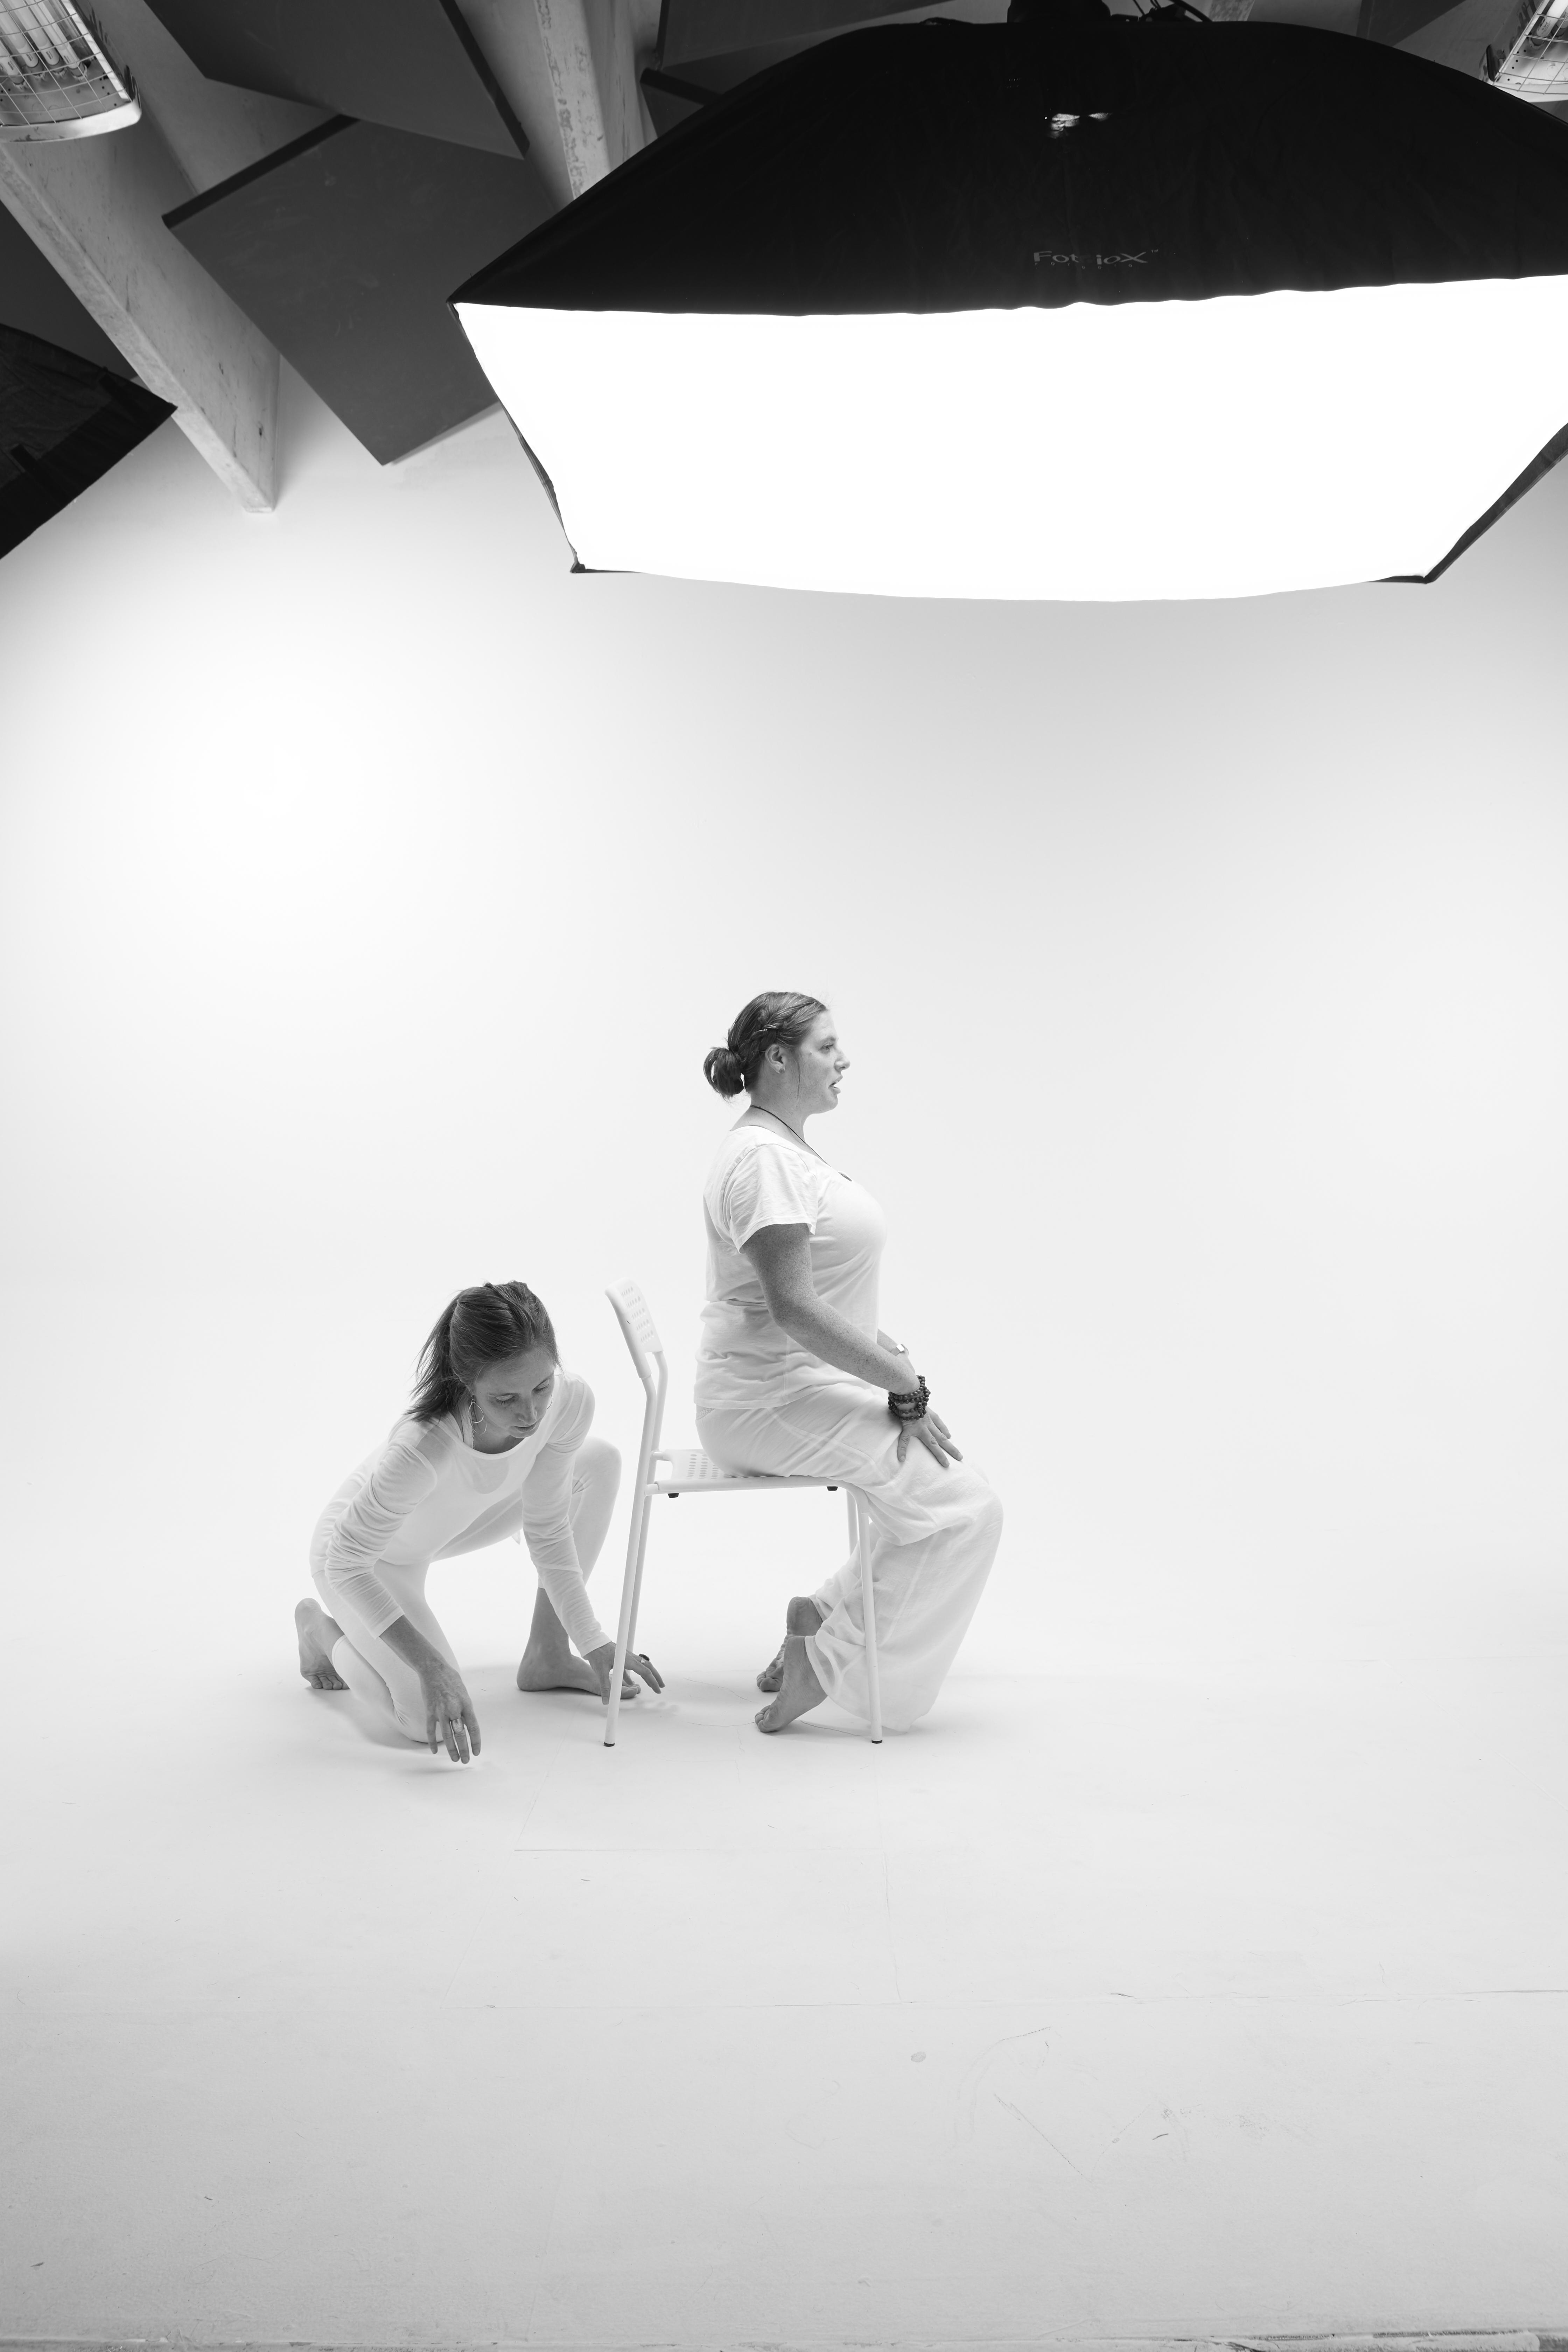 black and white image of yin yoga teacher Kaitlin Jackson demonstrating toe pose using a chair and Kari Kwinn preparing to support her